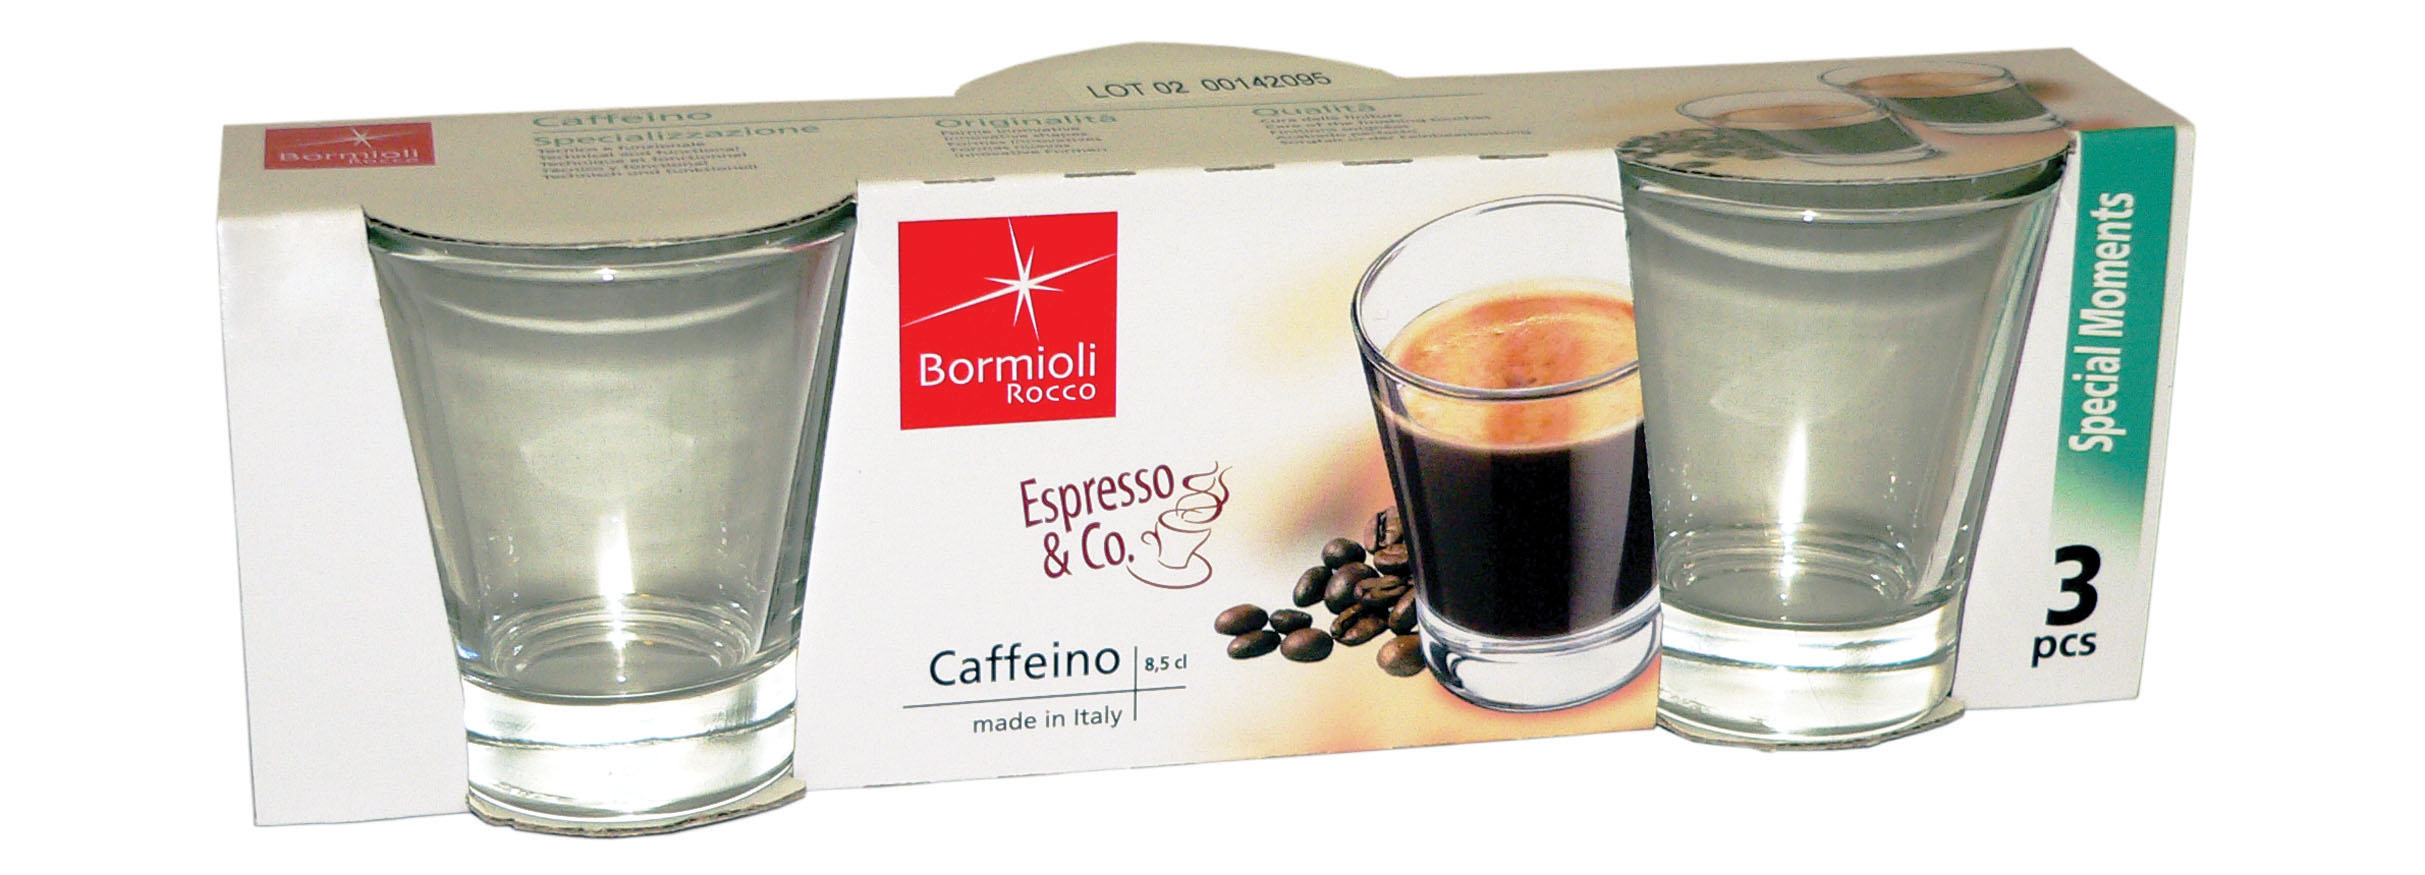 BICCH LIMONCINO CAFFEINO 3 PZ